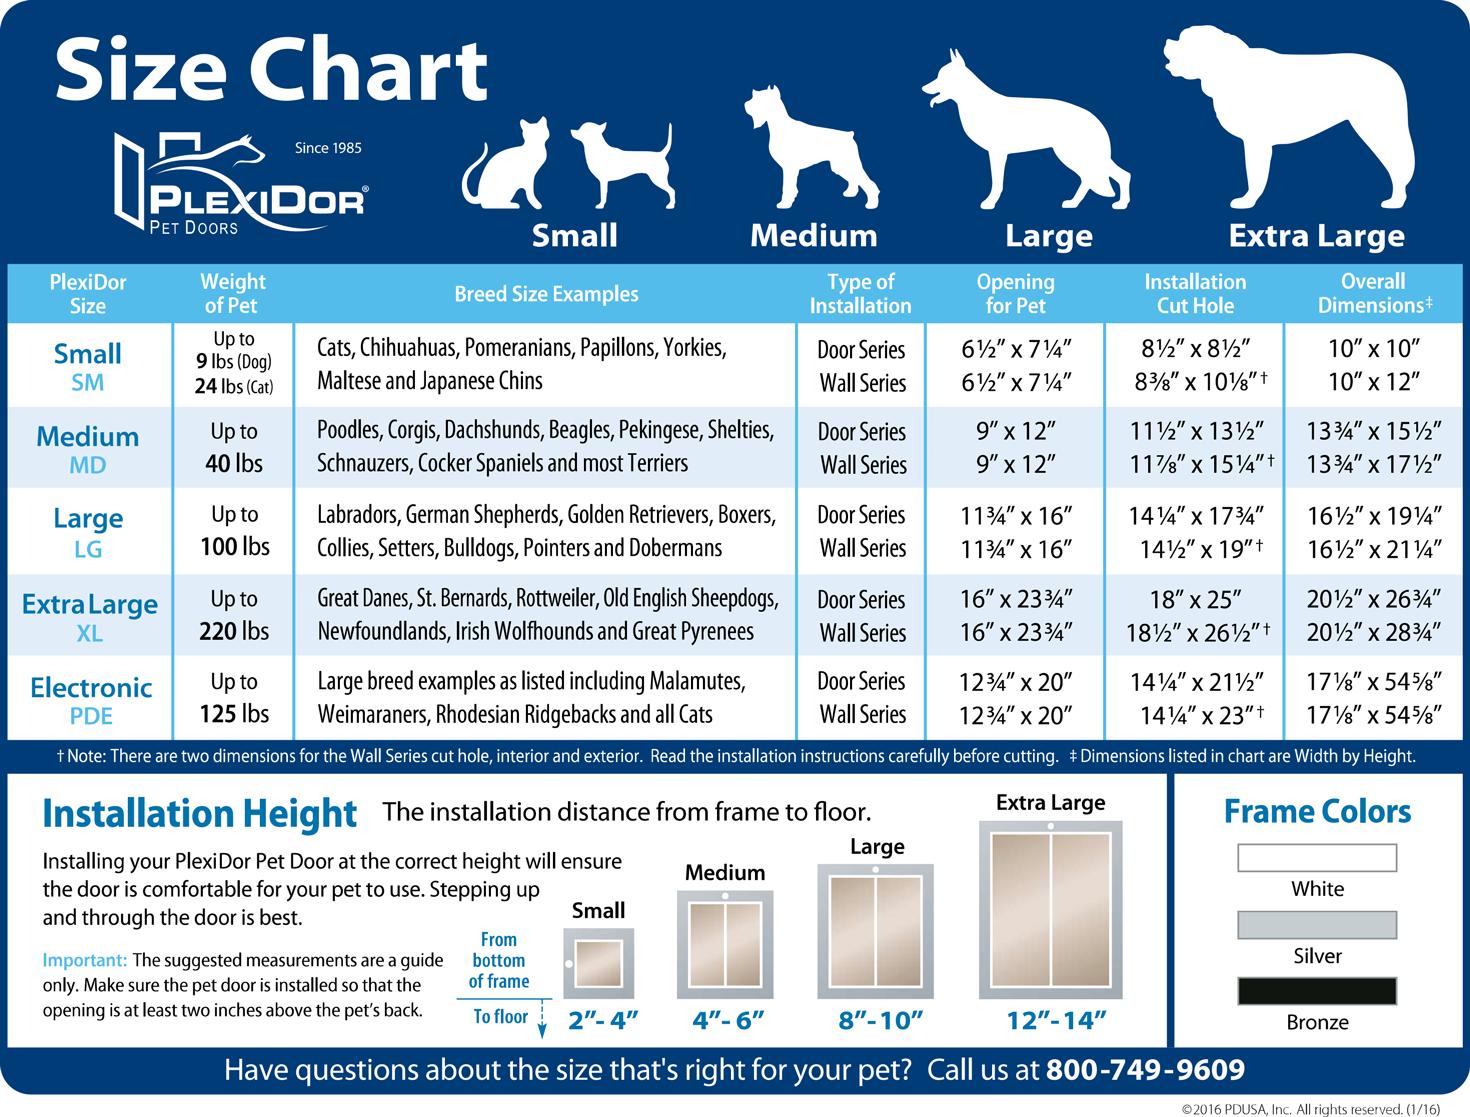 Plexidor-Size-Chart-2016-new